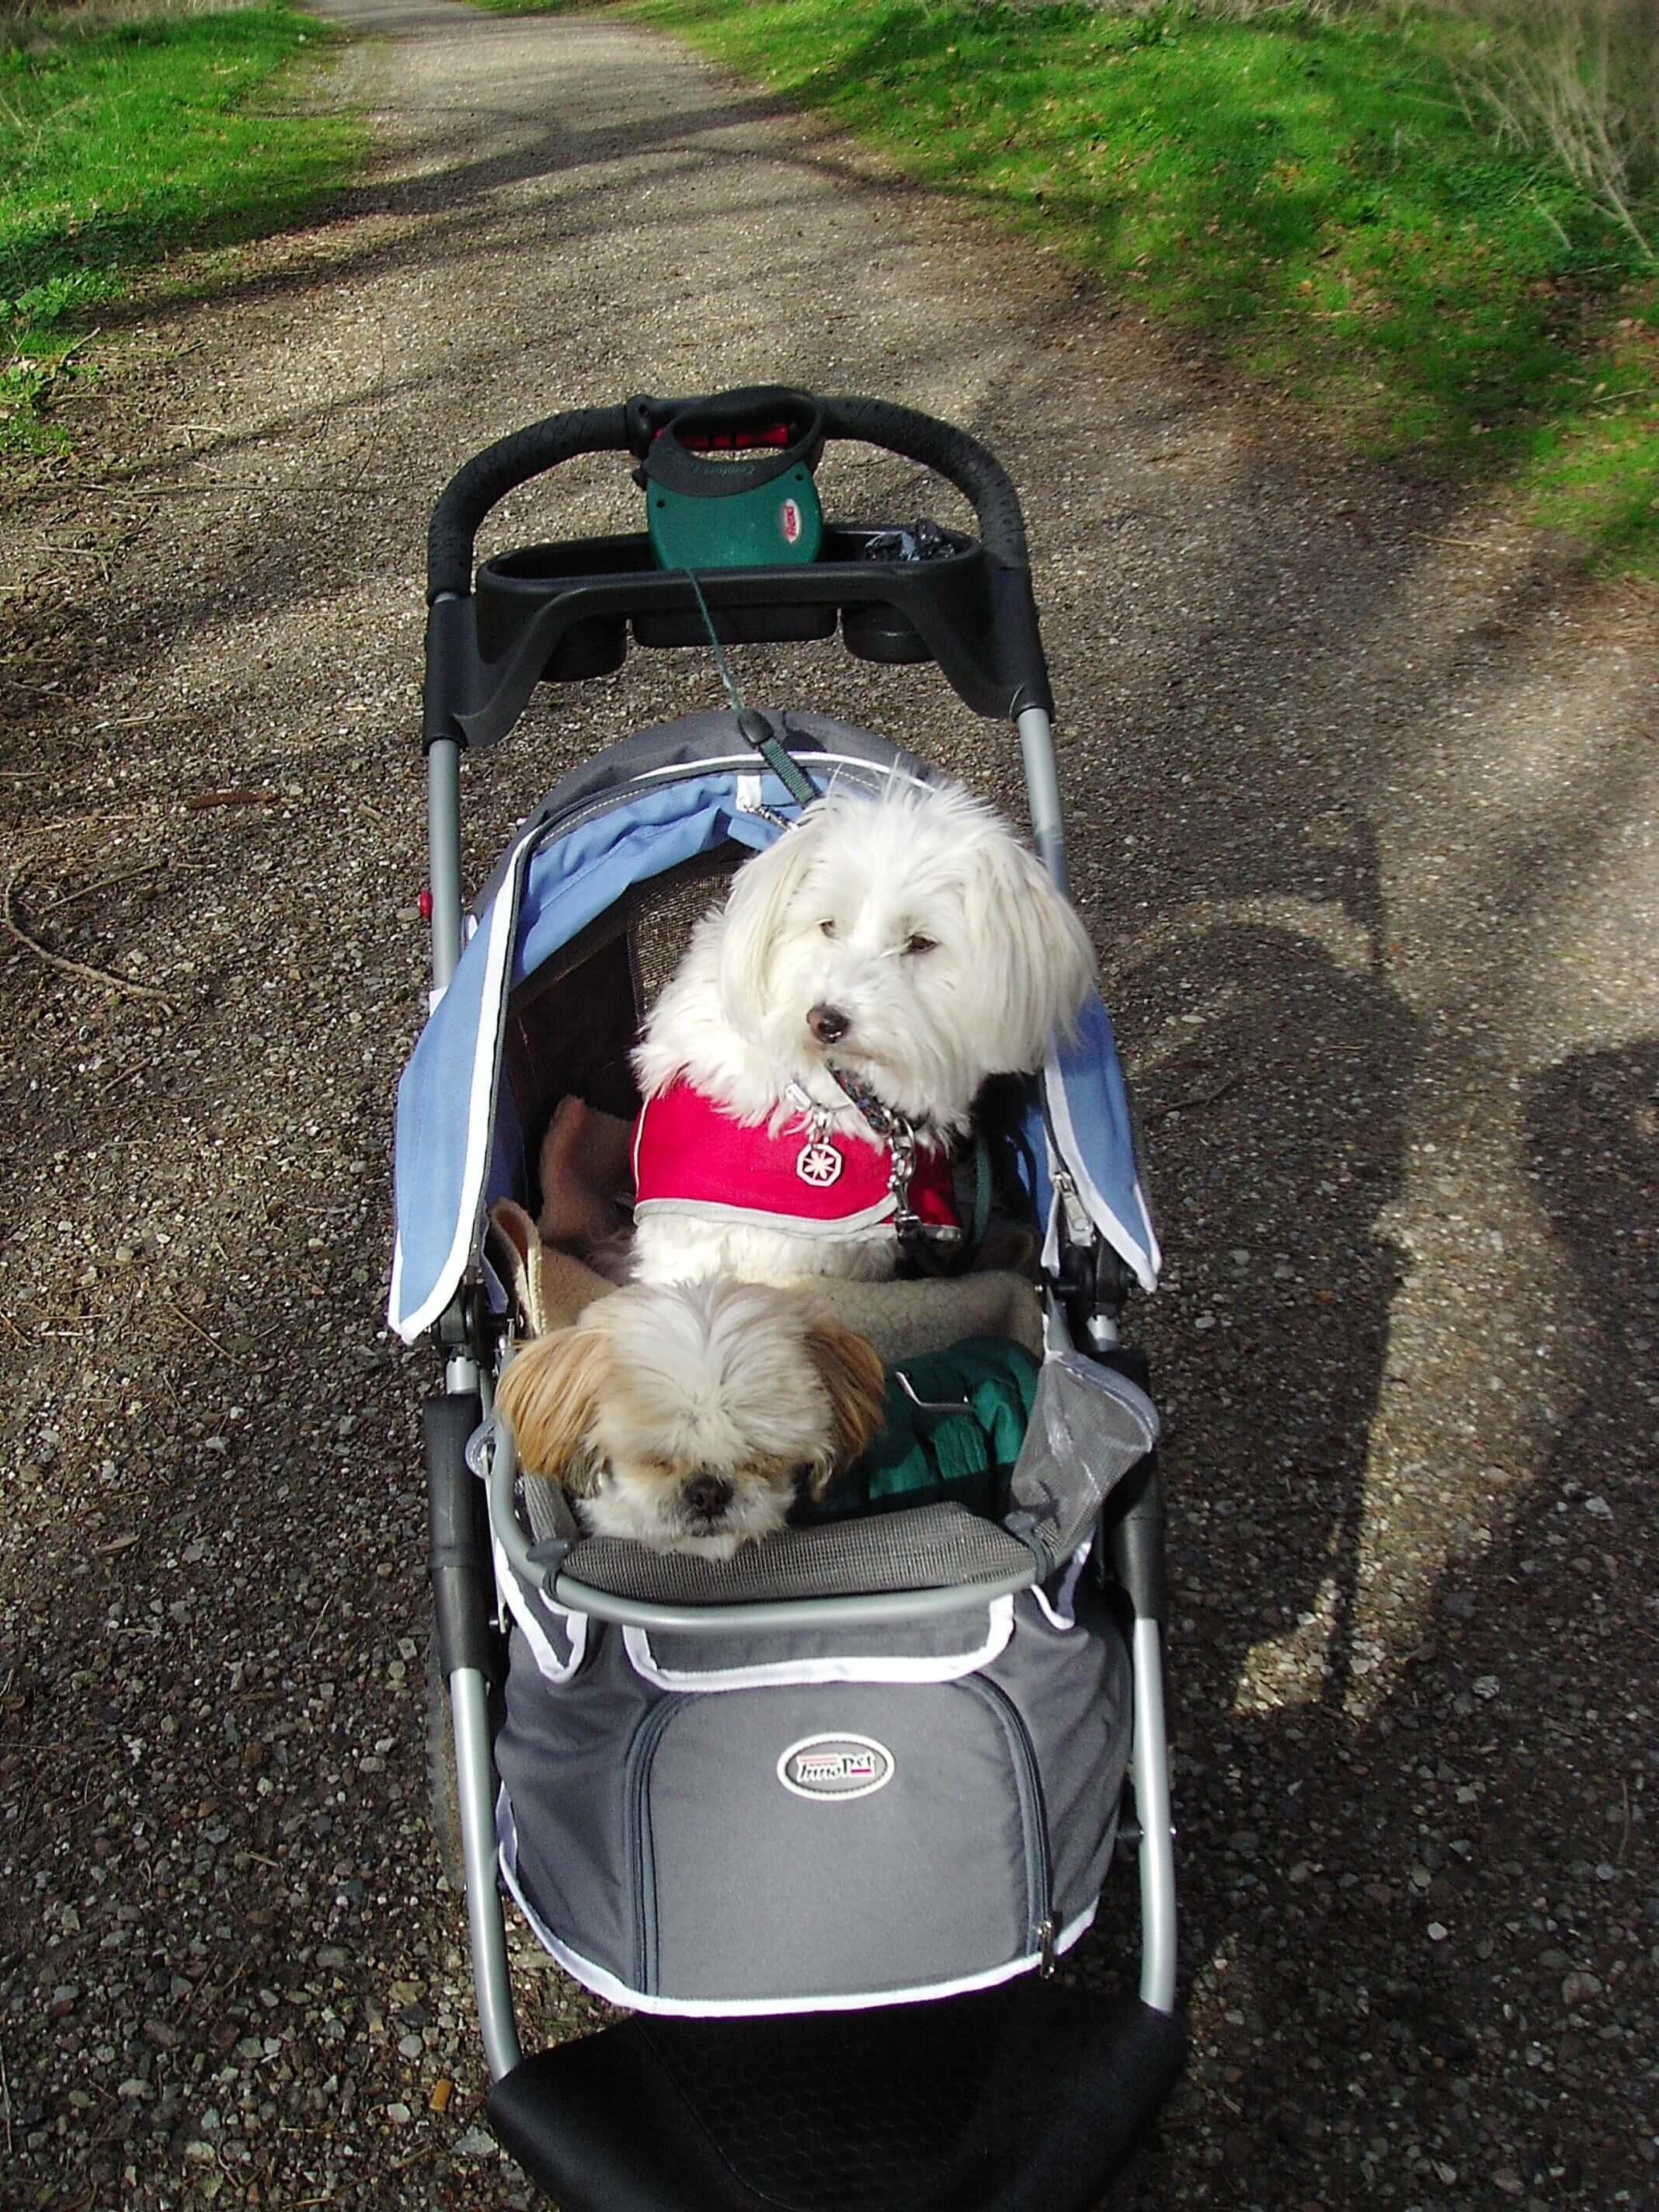 Hundebuggy bei Mobilitätsproblemen